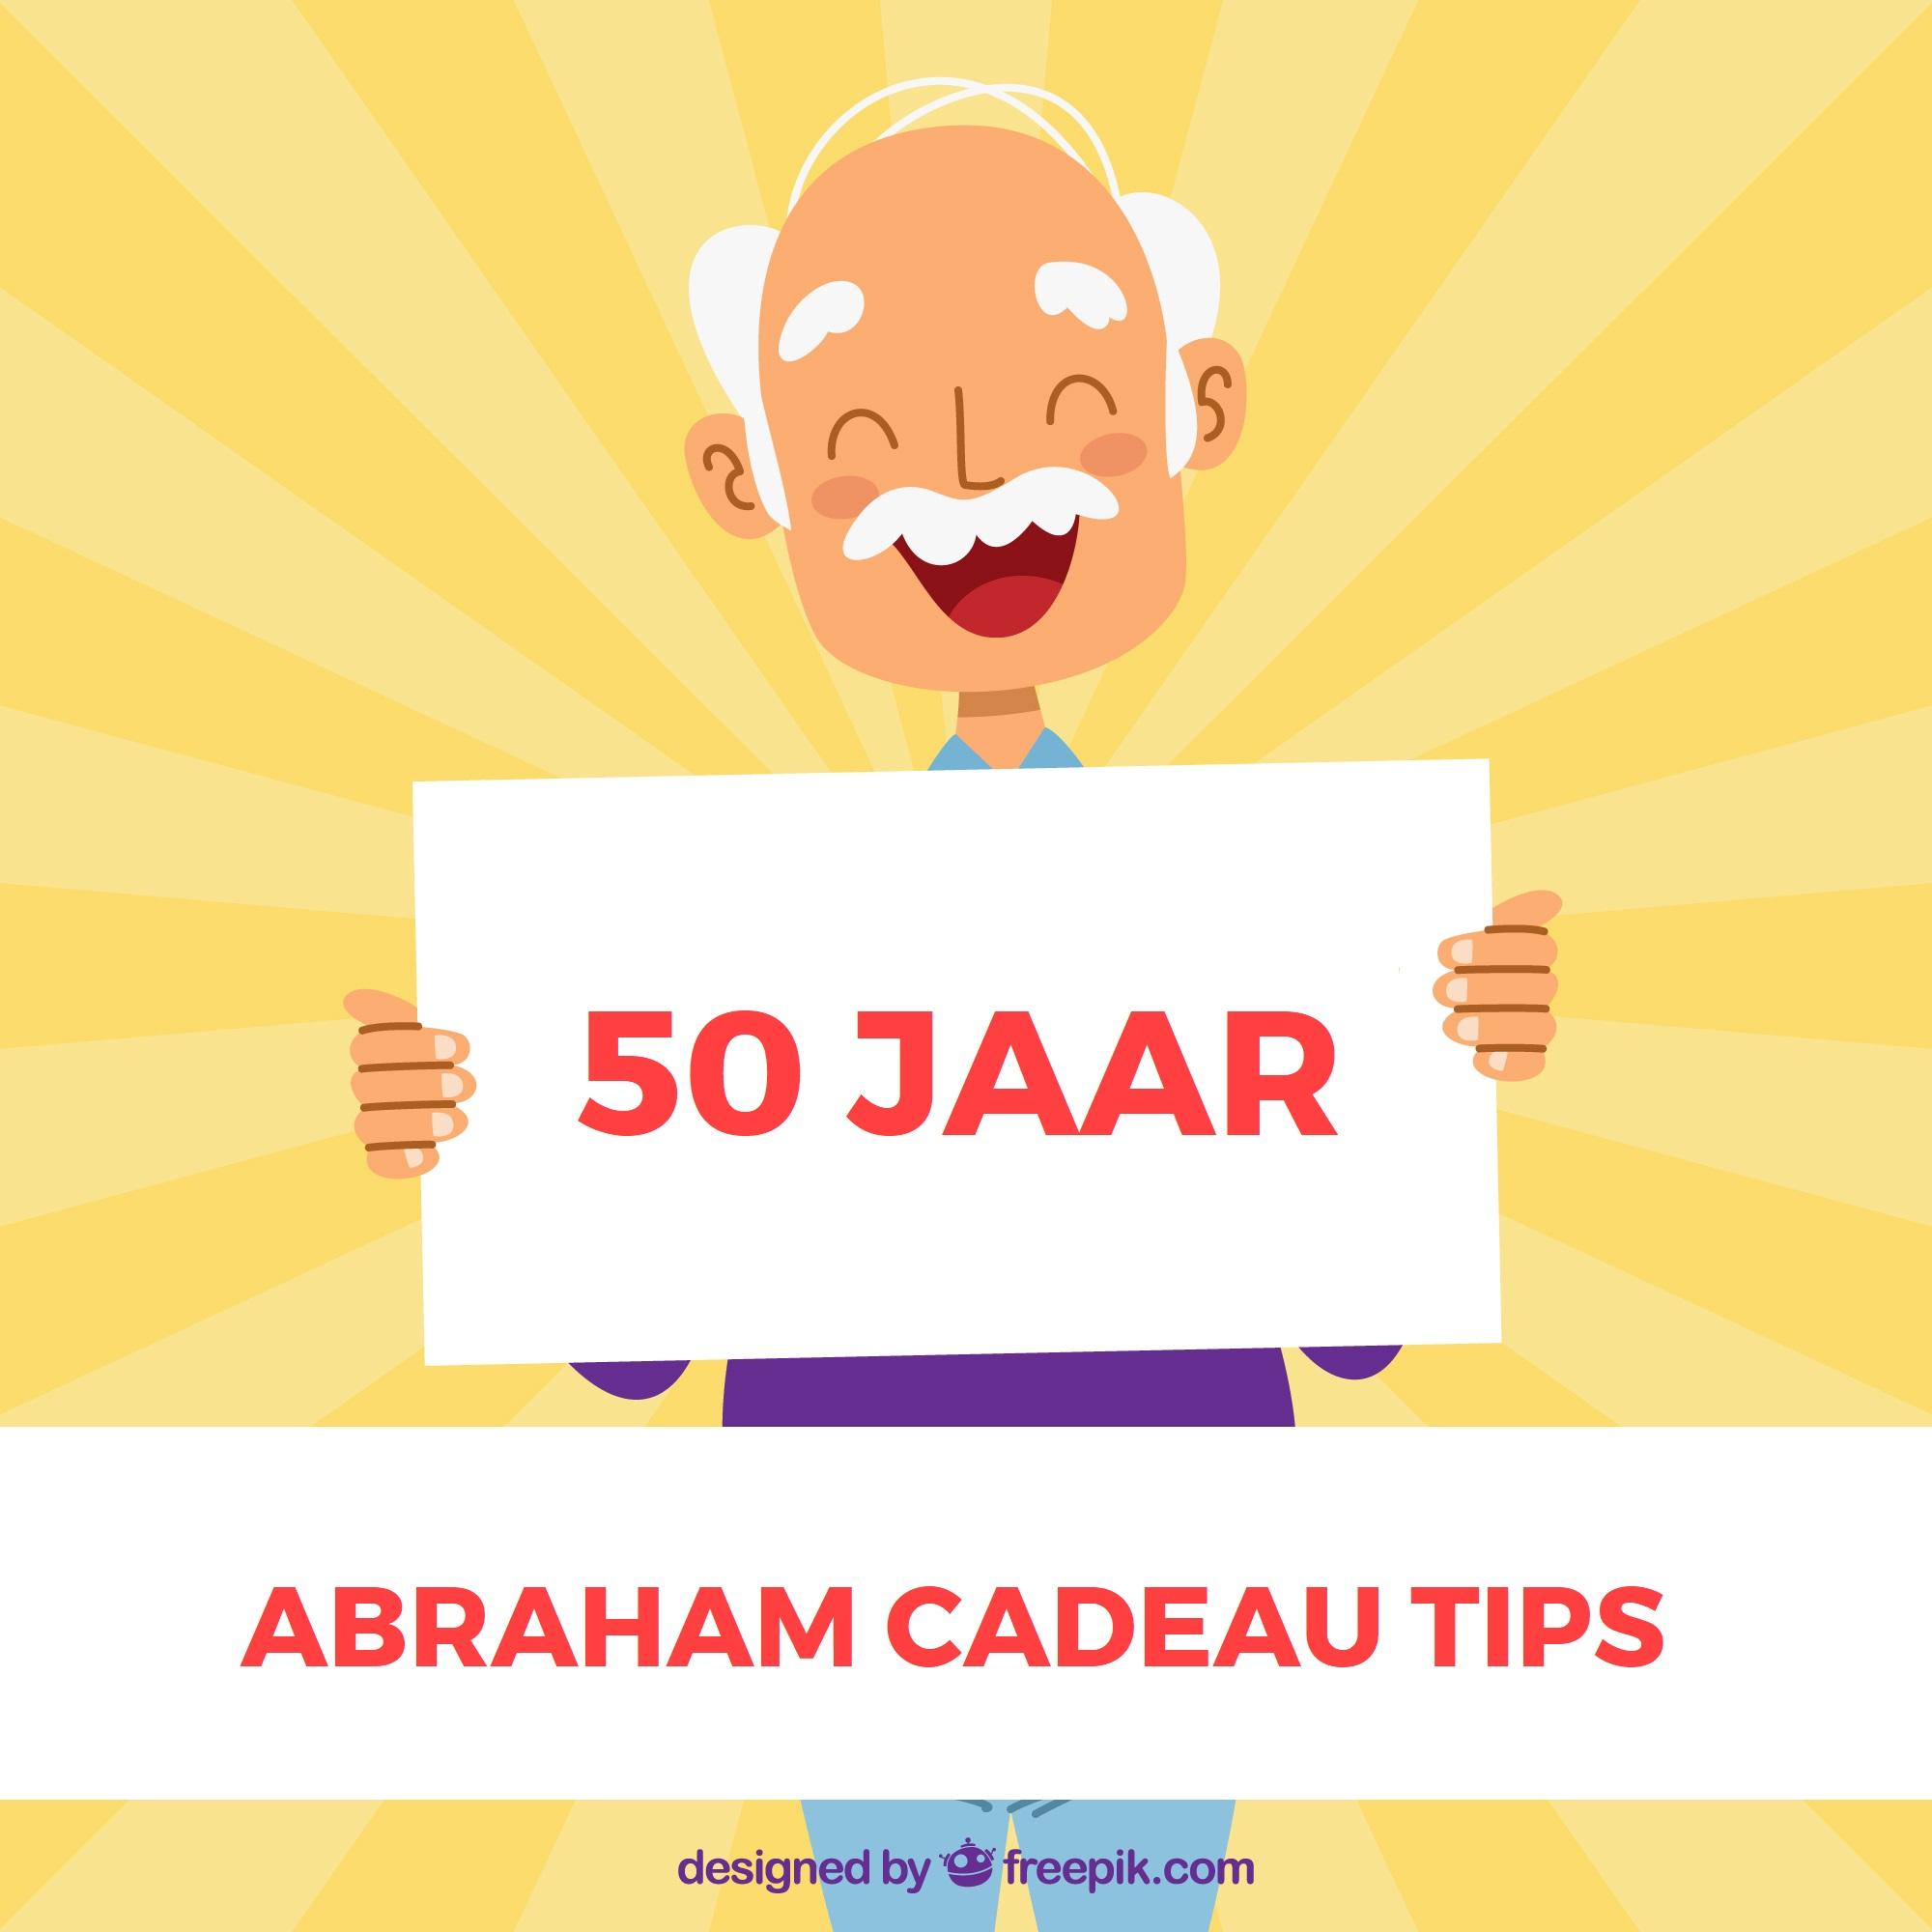 Ideeën: 50 jaar Abraham cadeau voor mannen